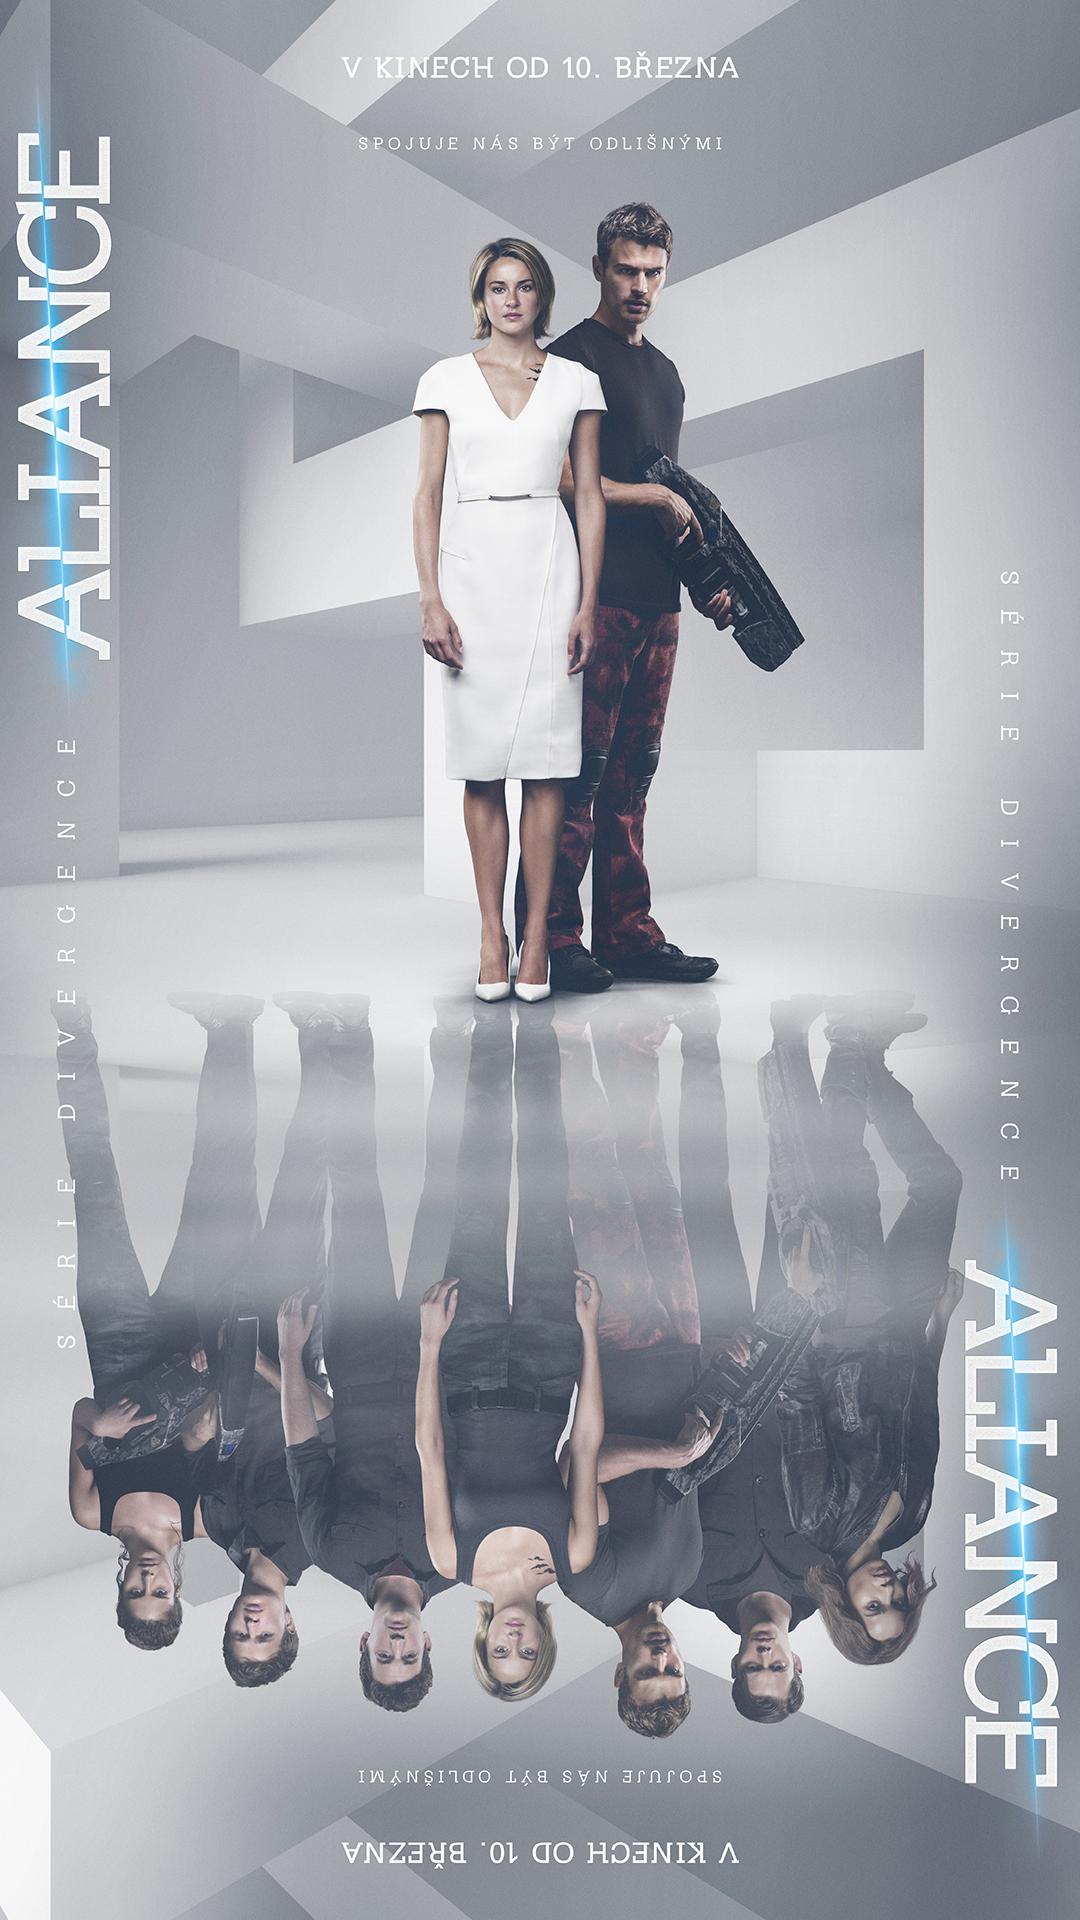 Aliance SD (2016)